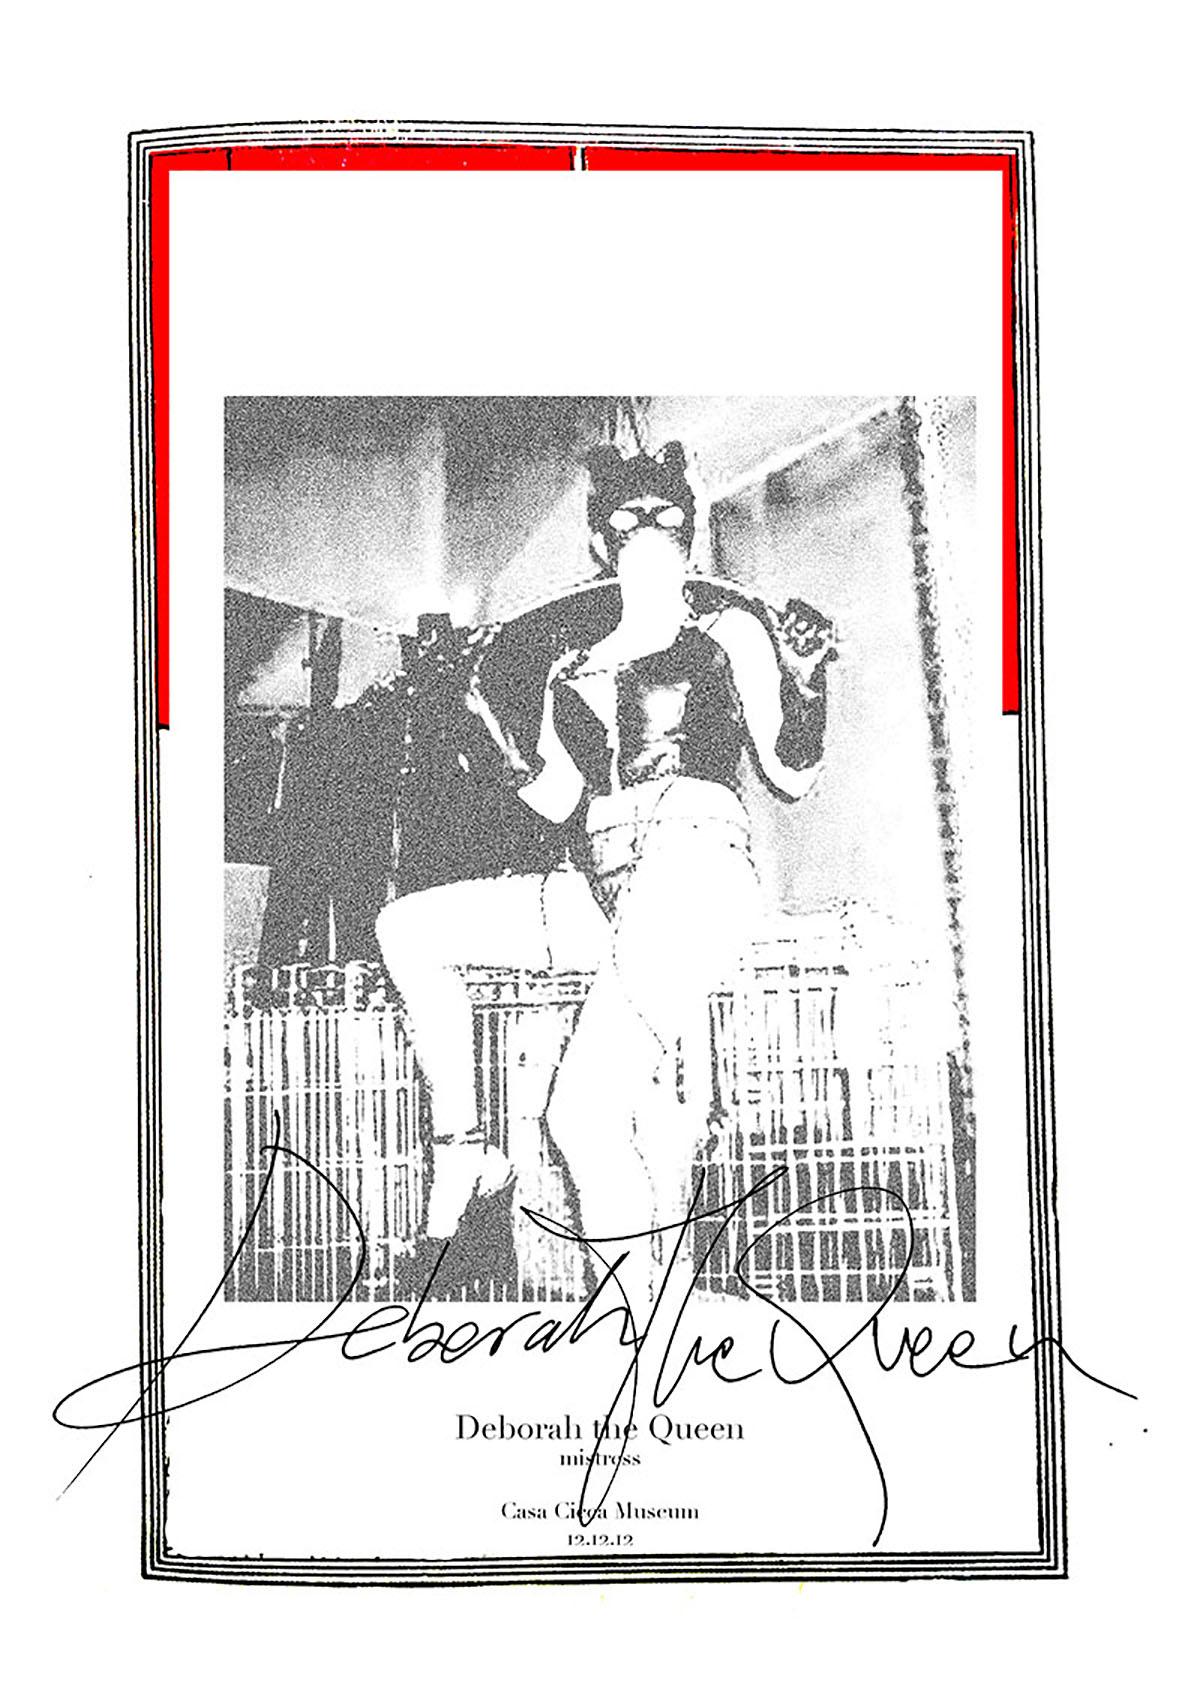 Deborah The Queen. Archive photo. Courtesy of Casa Cicca